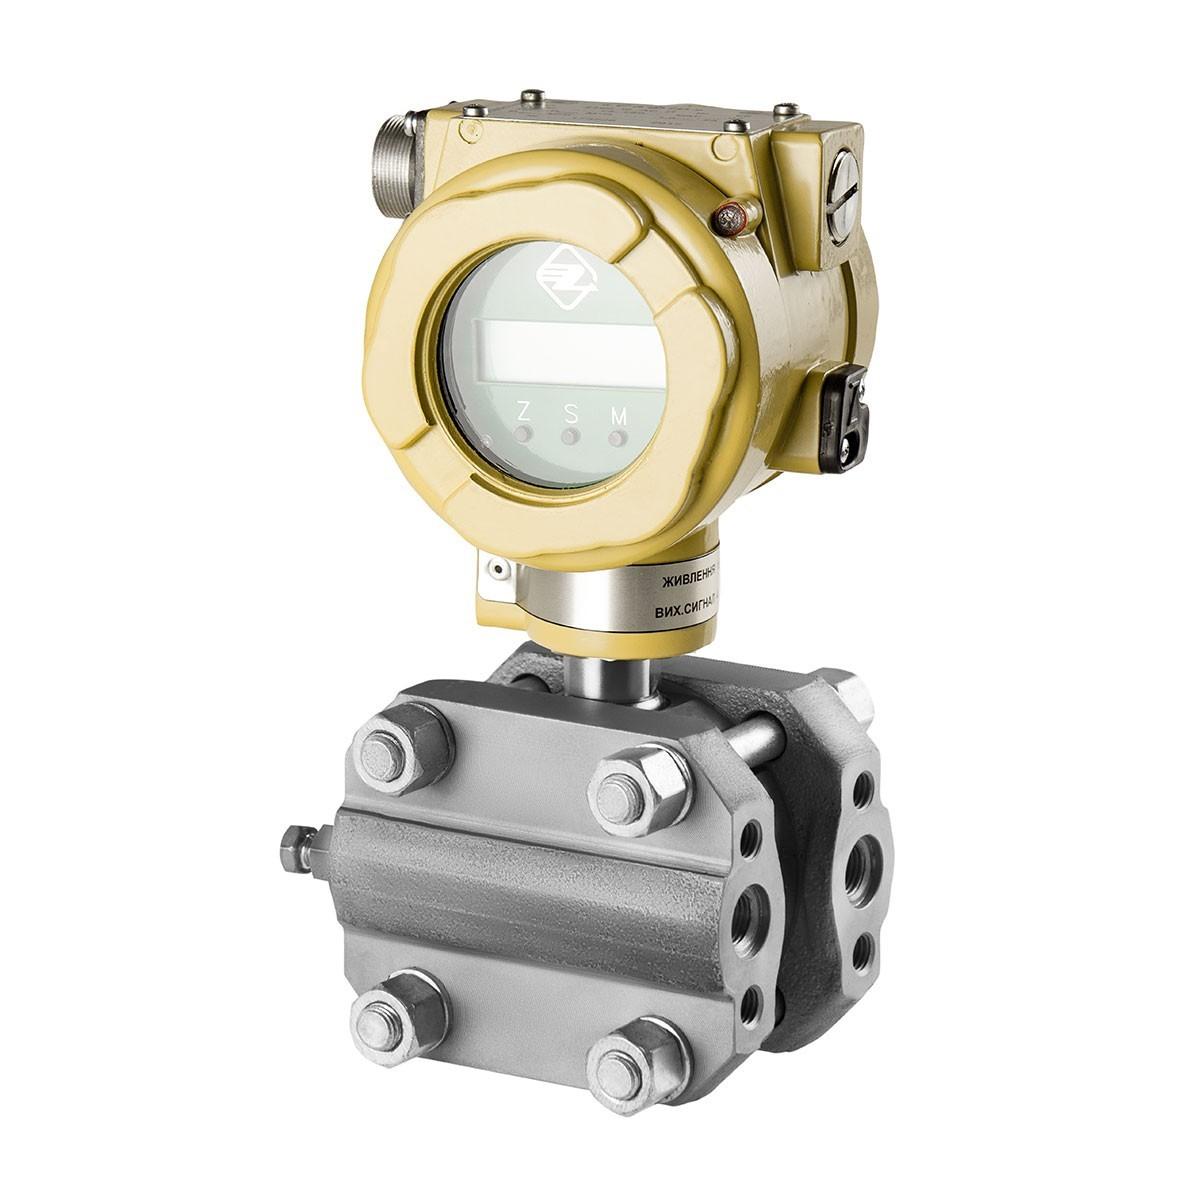 Digital Differential Pressure Transmitters Safir 2410 F